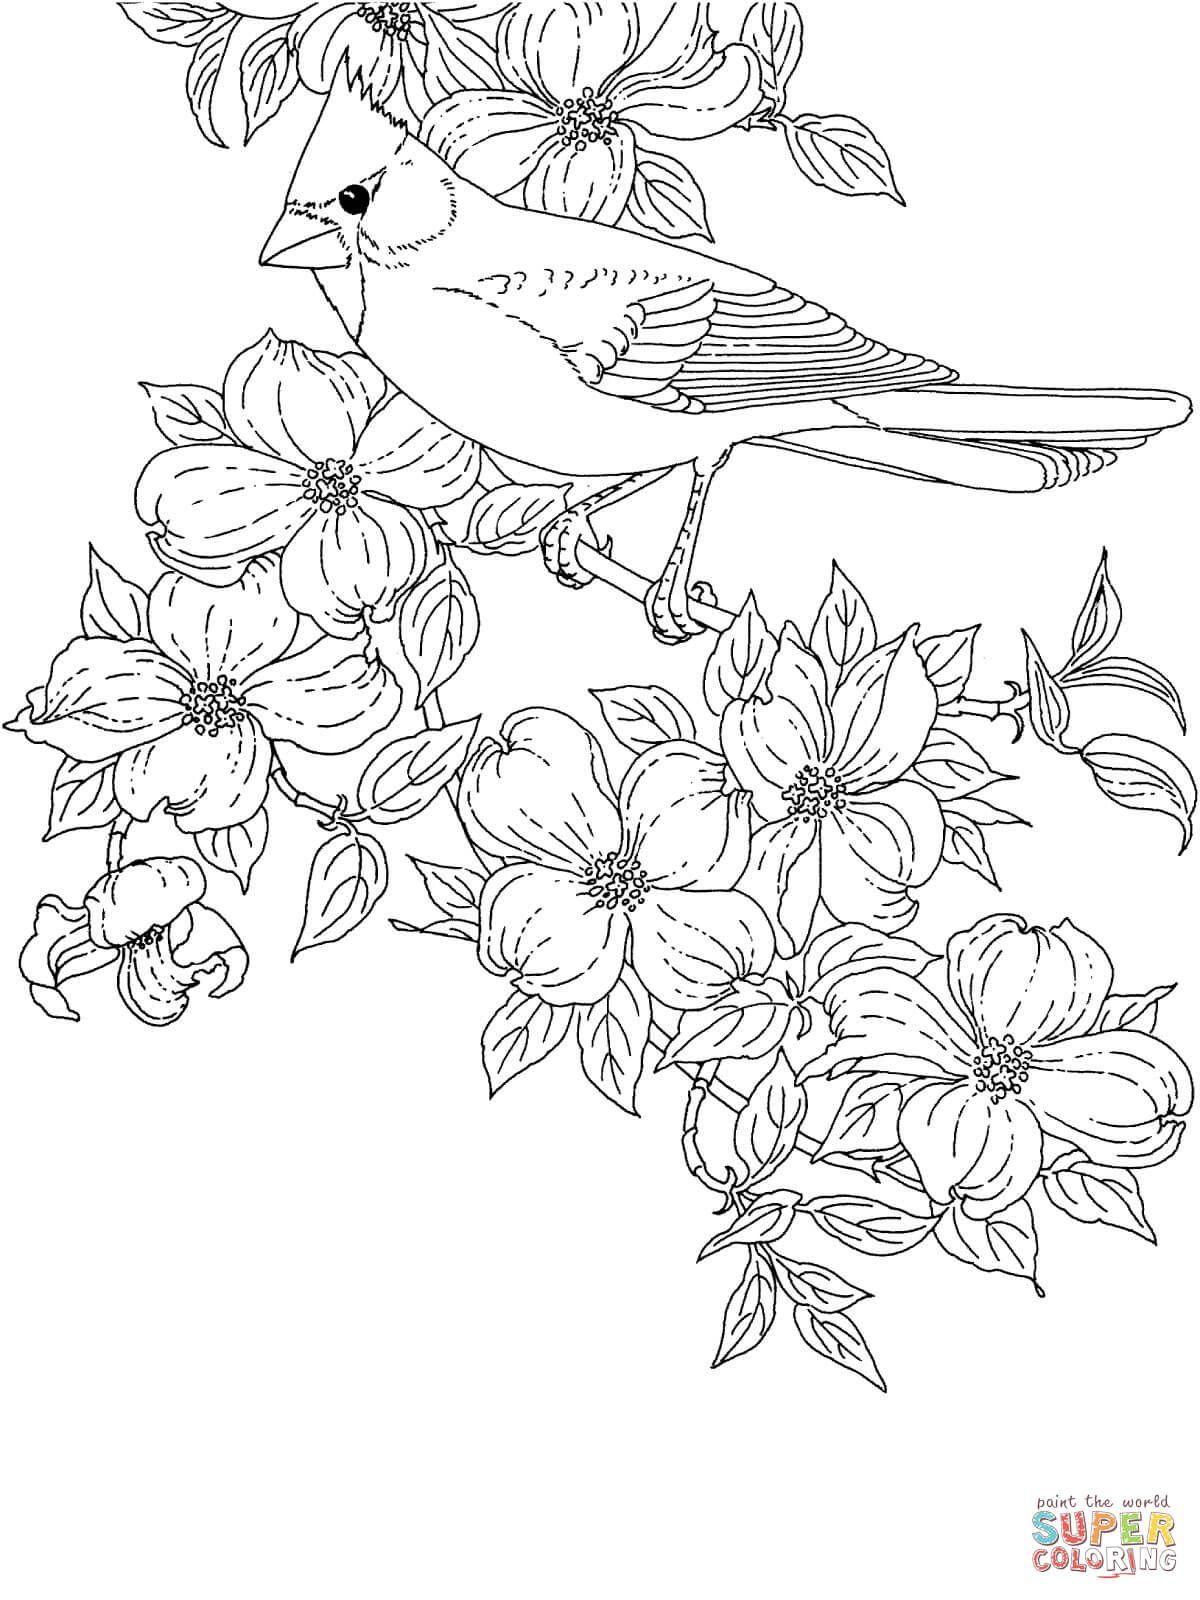 Cardinal bird and flowering virginia state flower super coloring